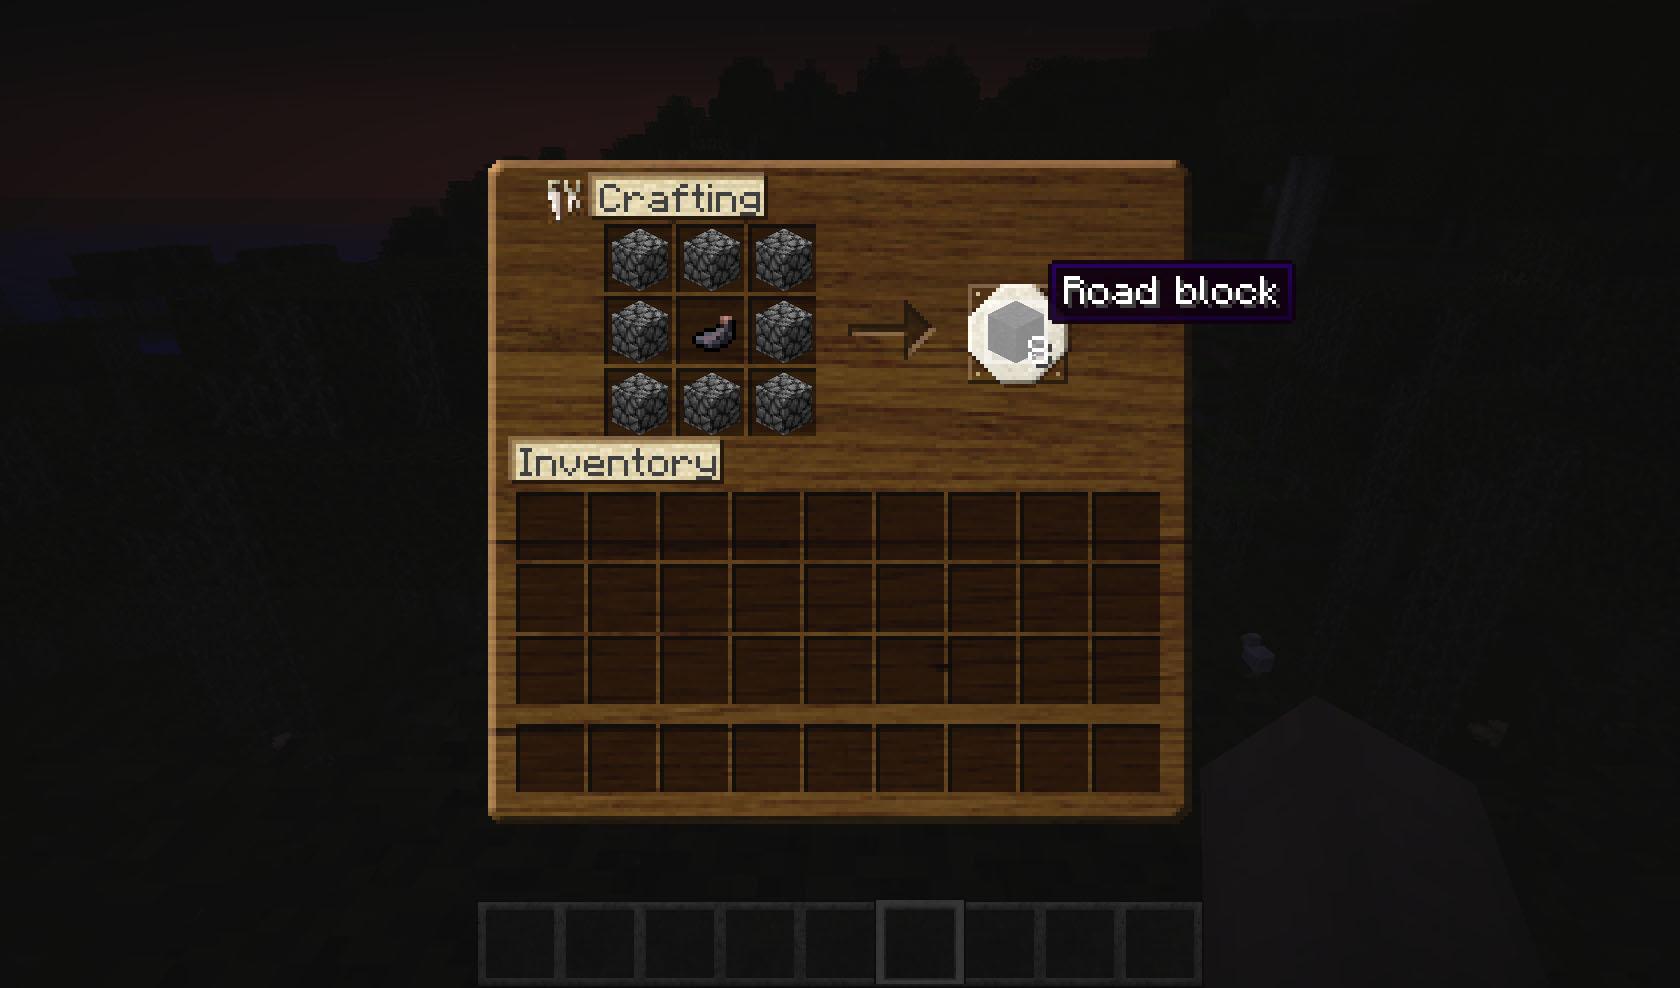 https://i1.wp.com/cdn.9pety.com/imgs/Mods/RoadWorks-Mod-1.jpg?ssl=1